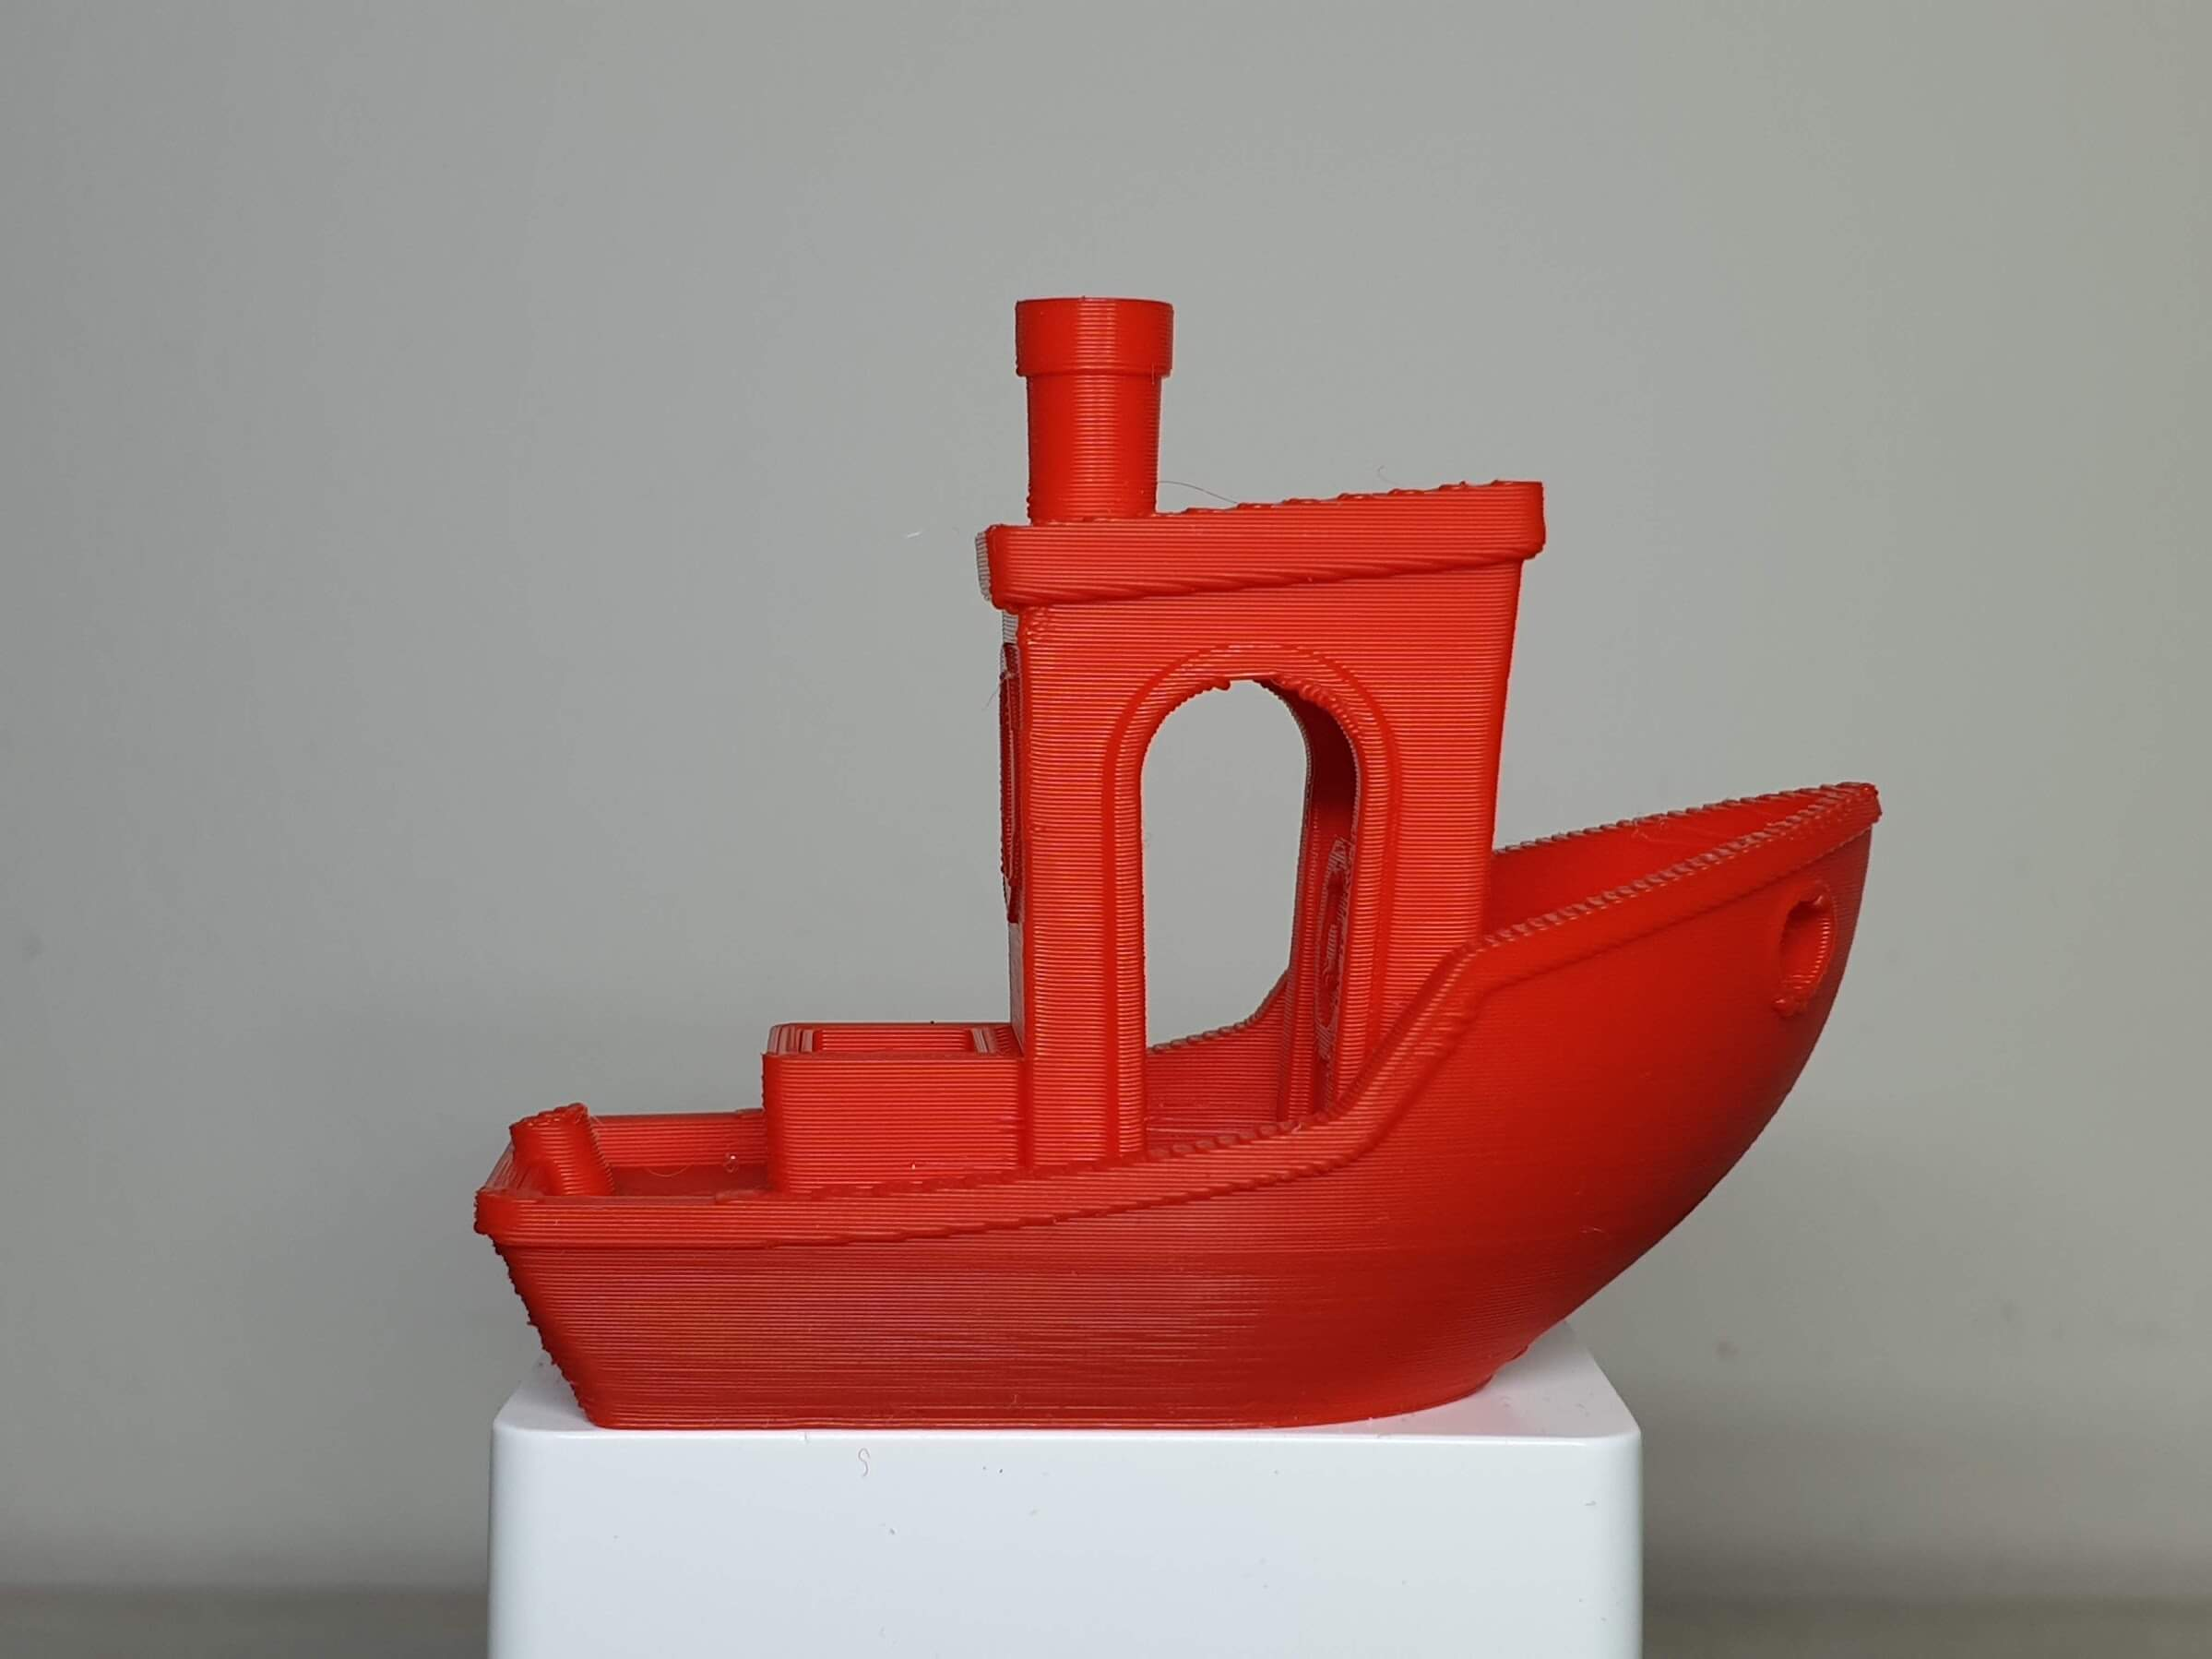 BIQU-B1-3D-Benchy-print-test-5